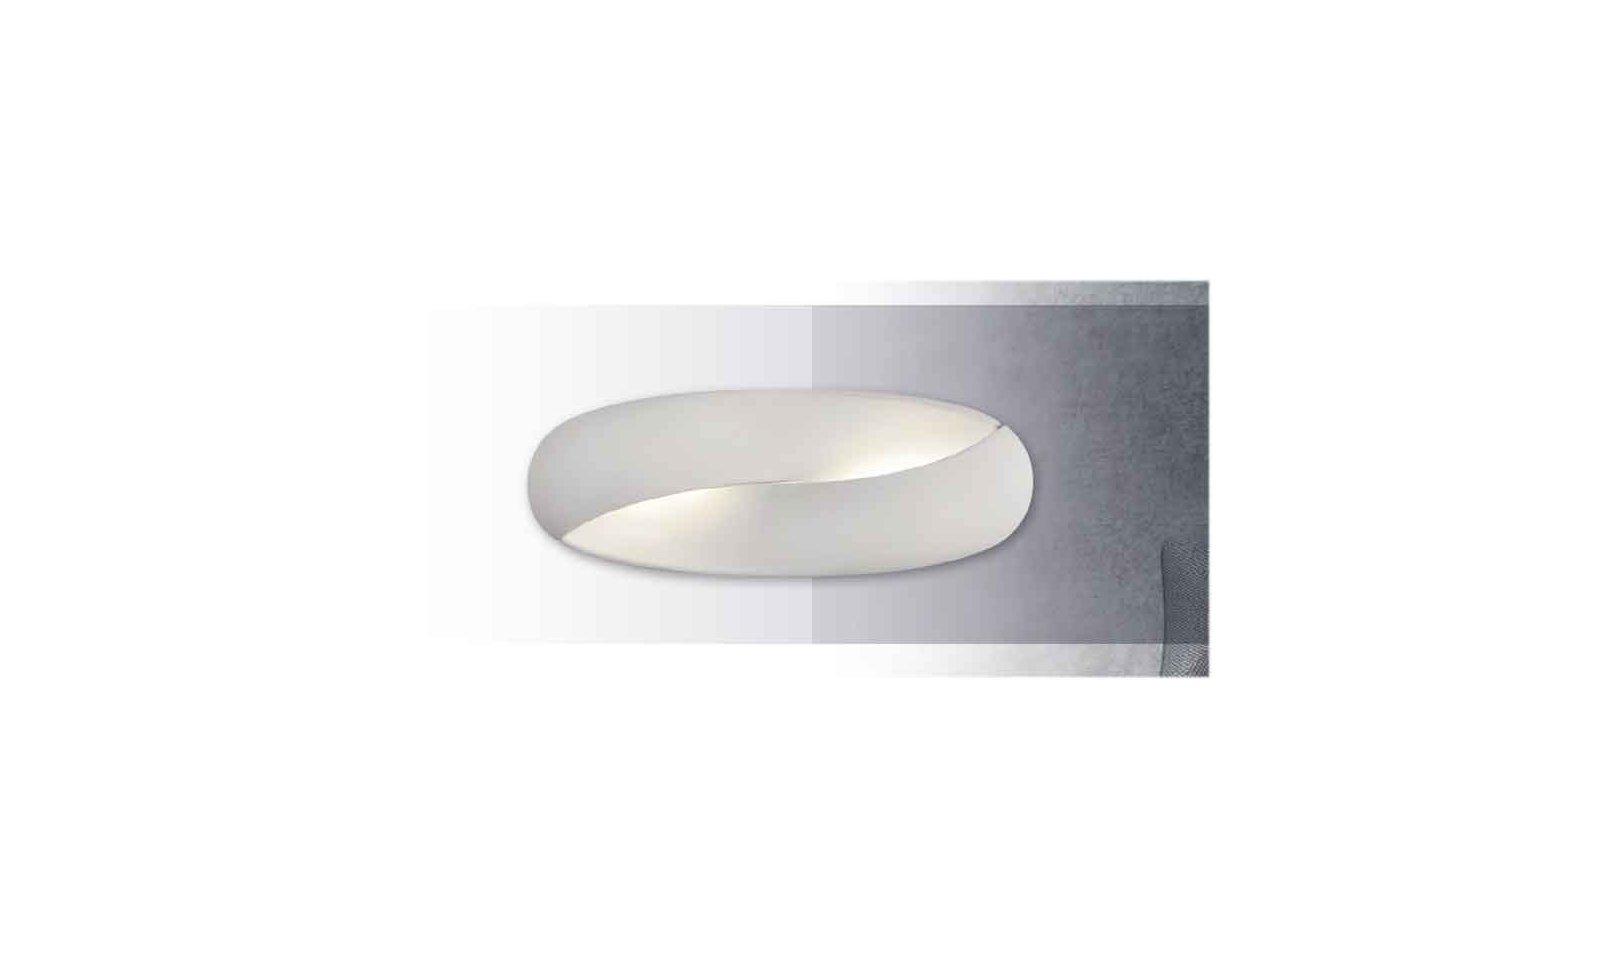 Acb norma applique led in metallo e metacrilato bianco lampada moderna